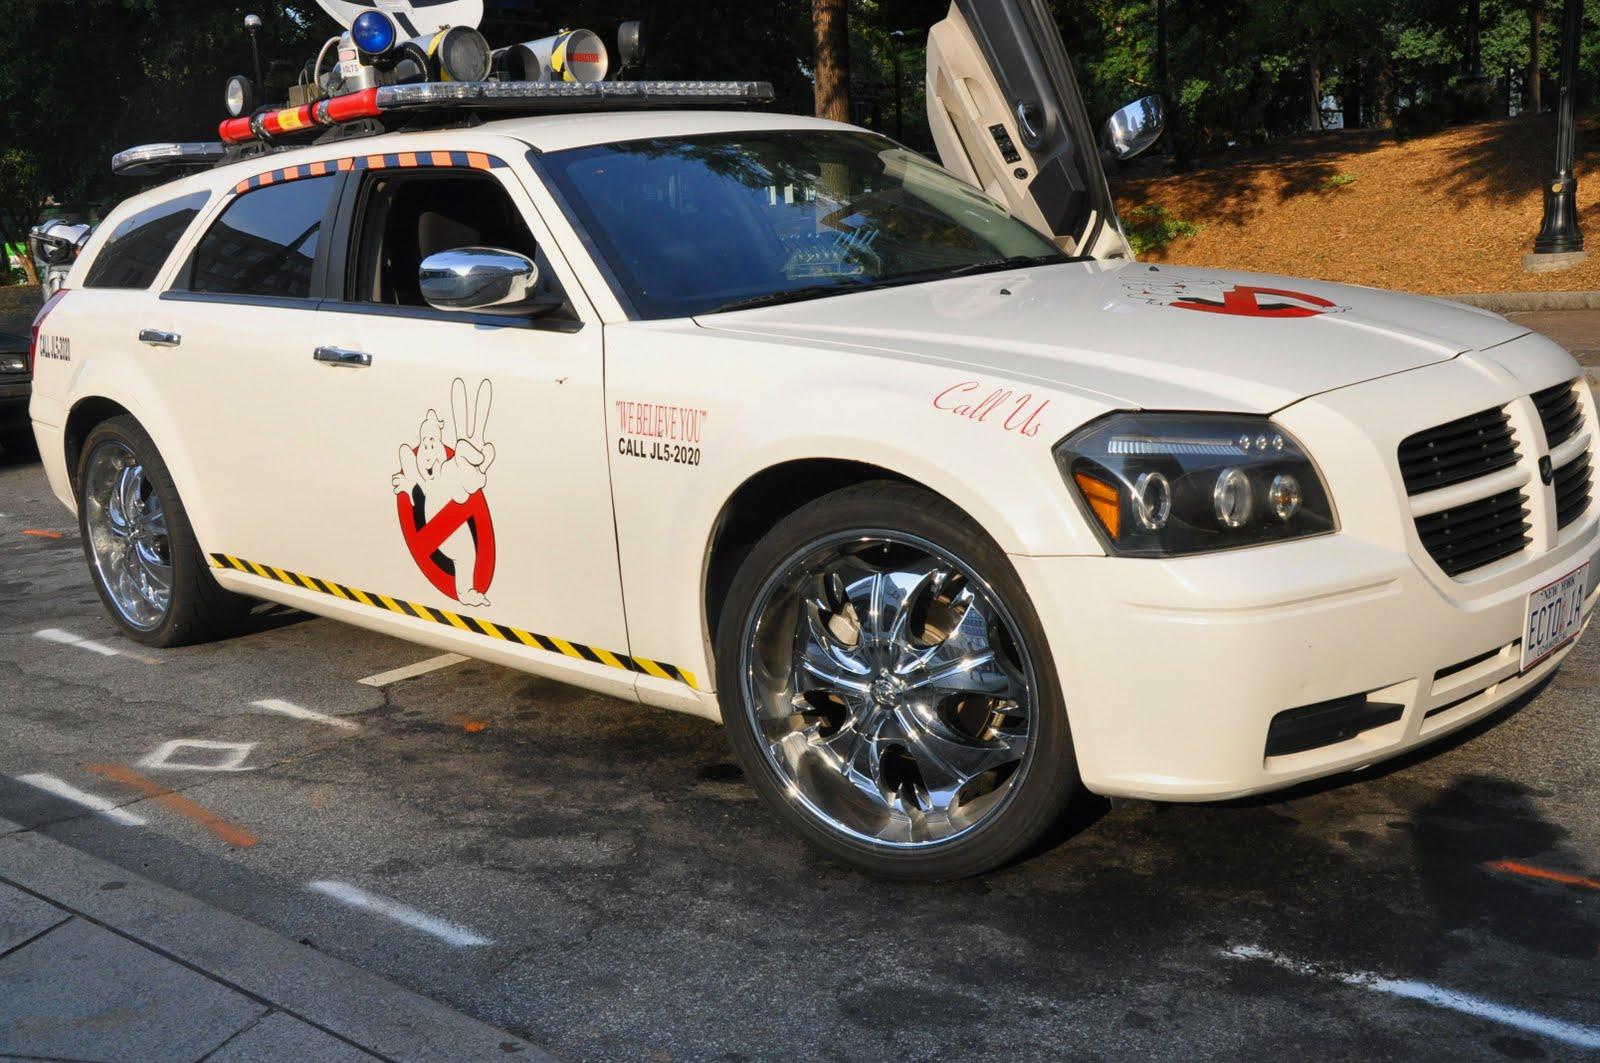 Ghostbusters 3 Car Magnum Arts: 8/1/11